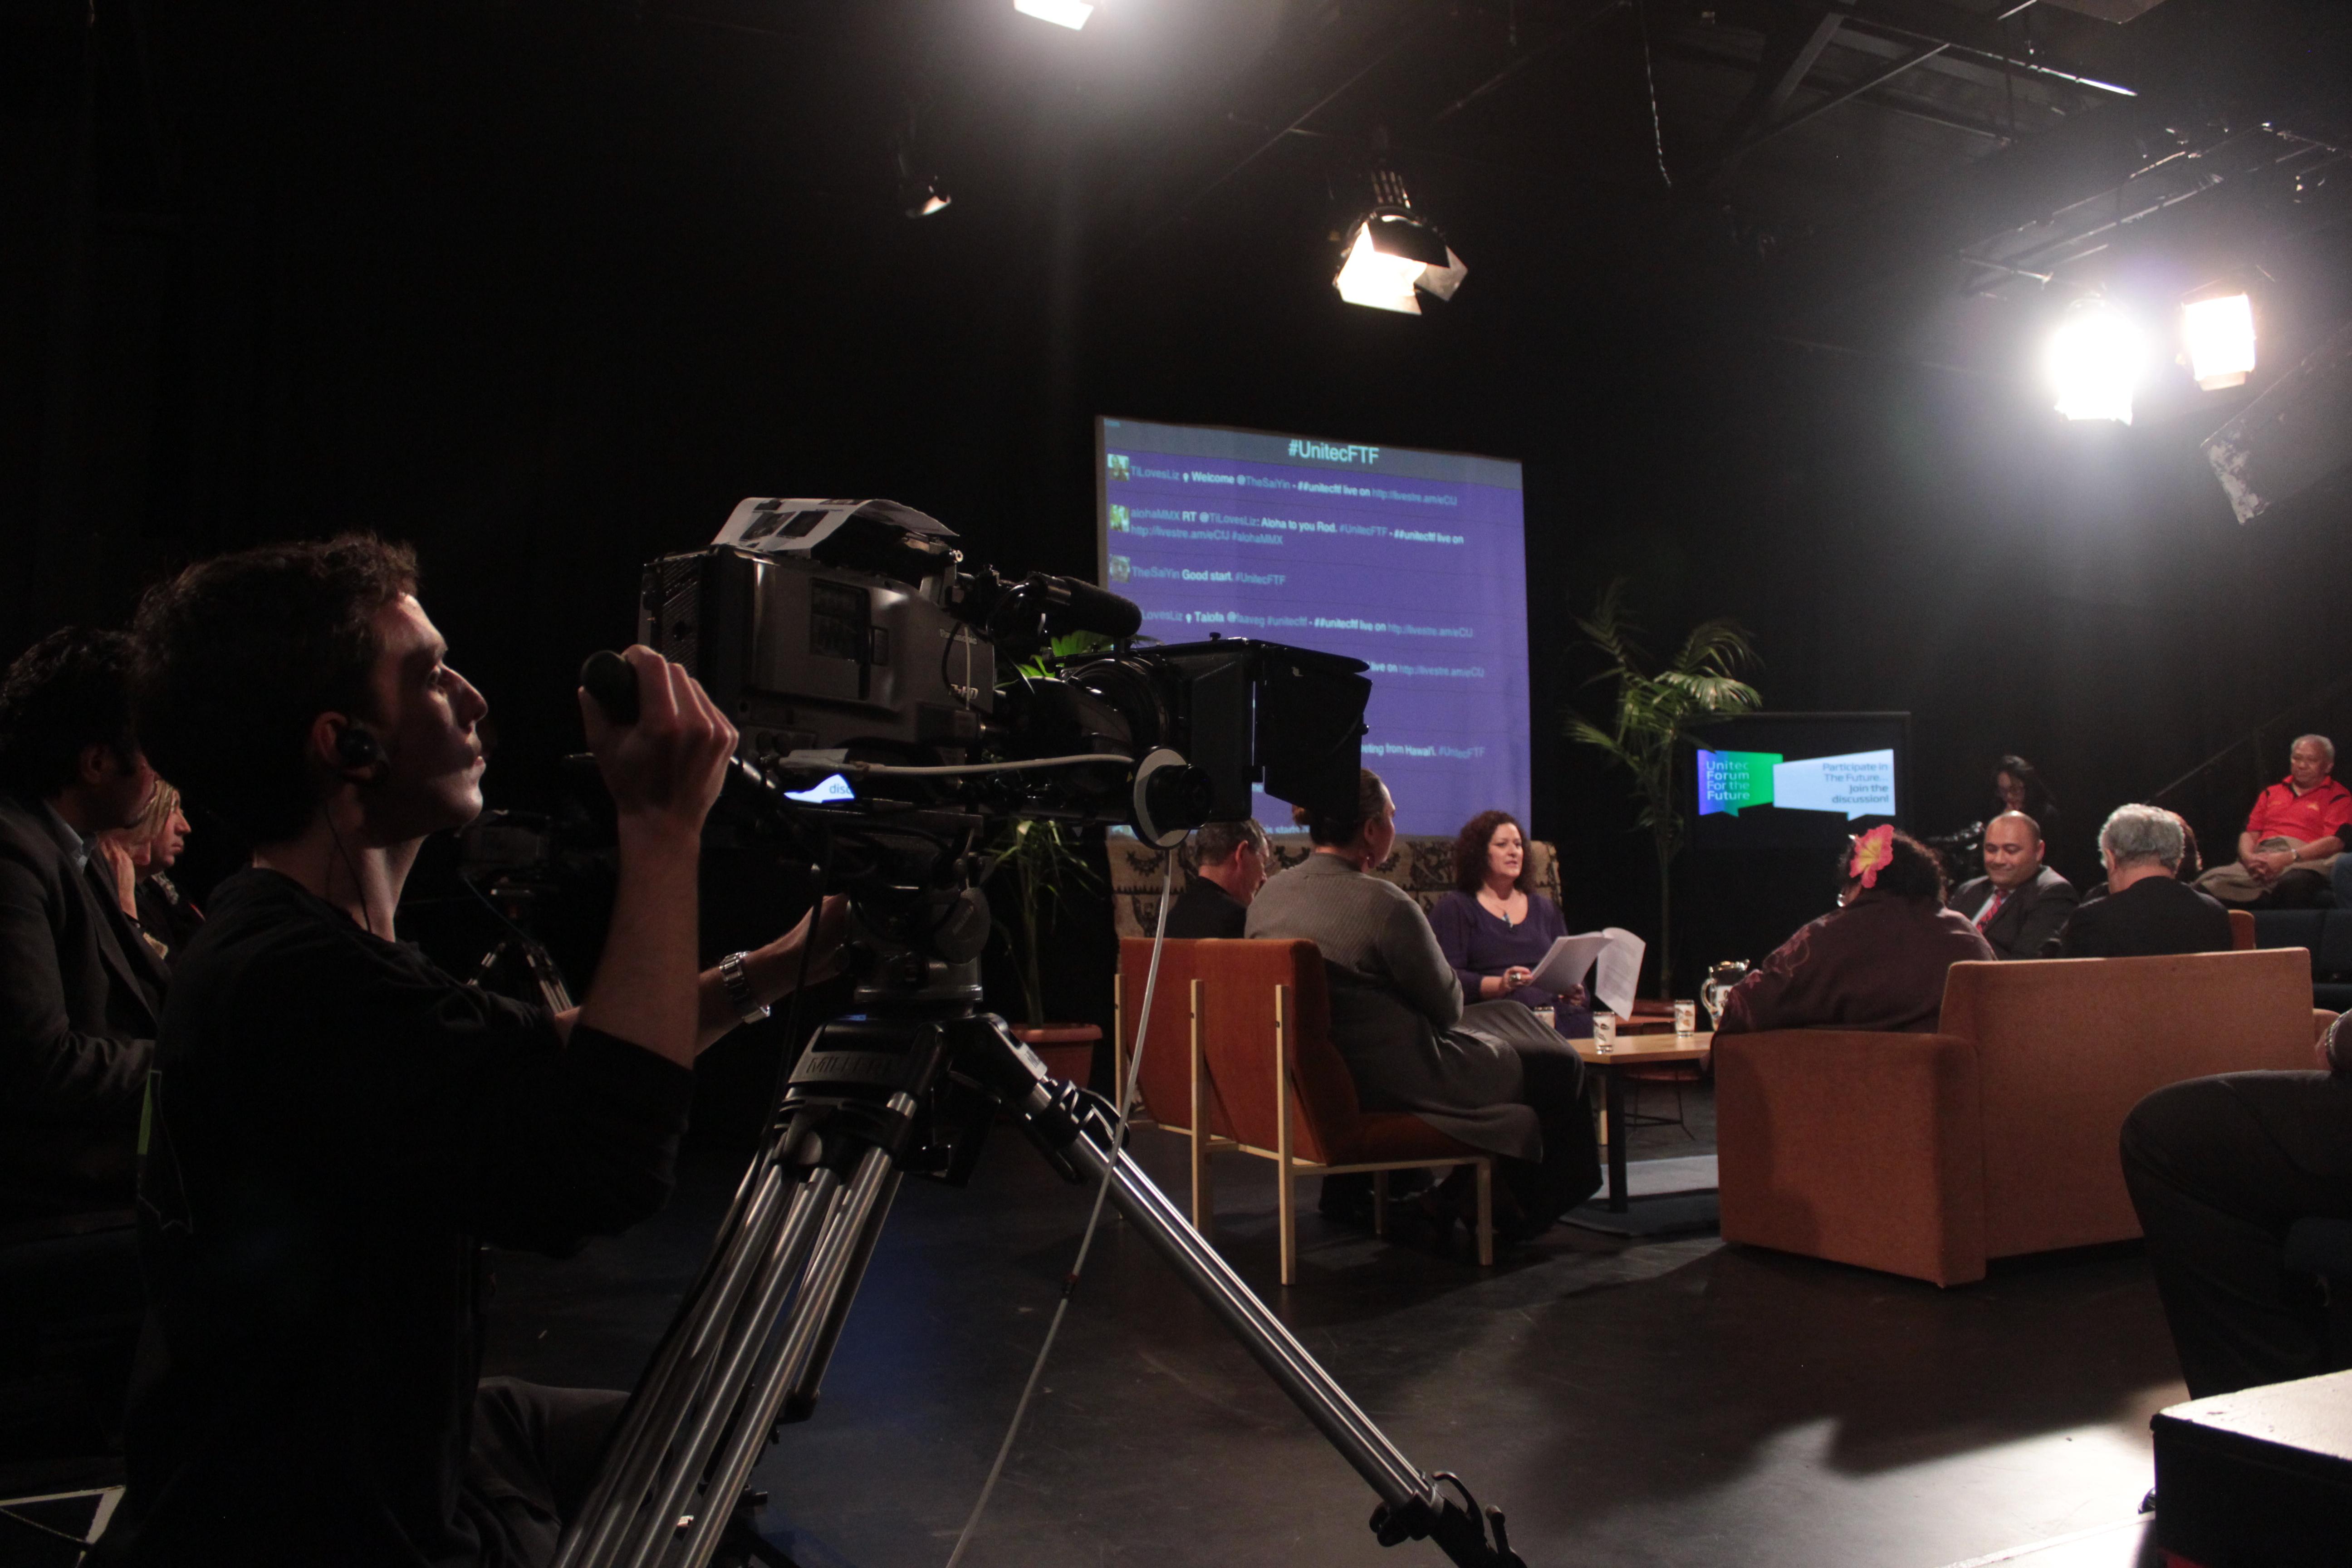 File:Unitec Forum of the Future 2011 jpg - Wikimedia Commons